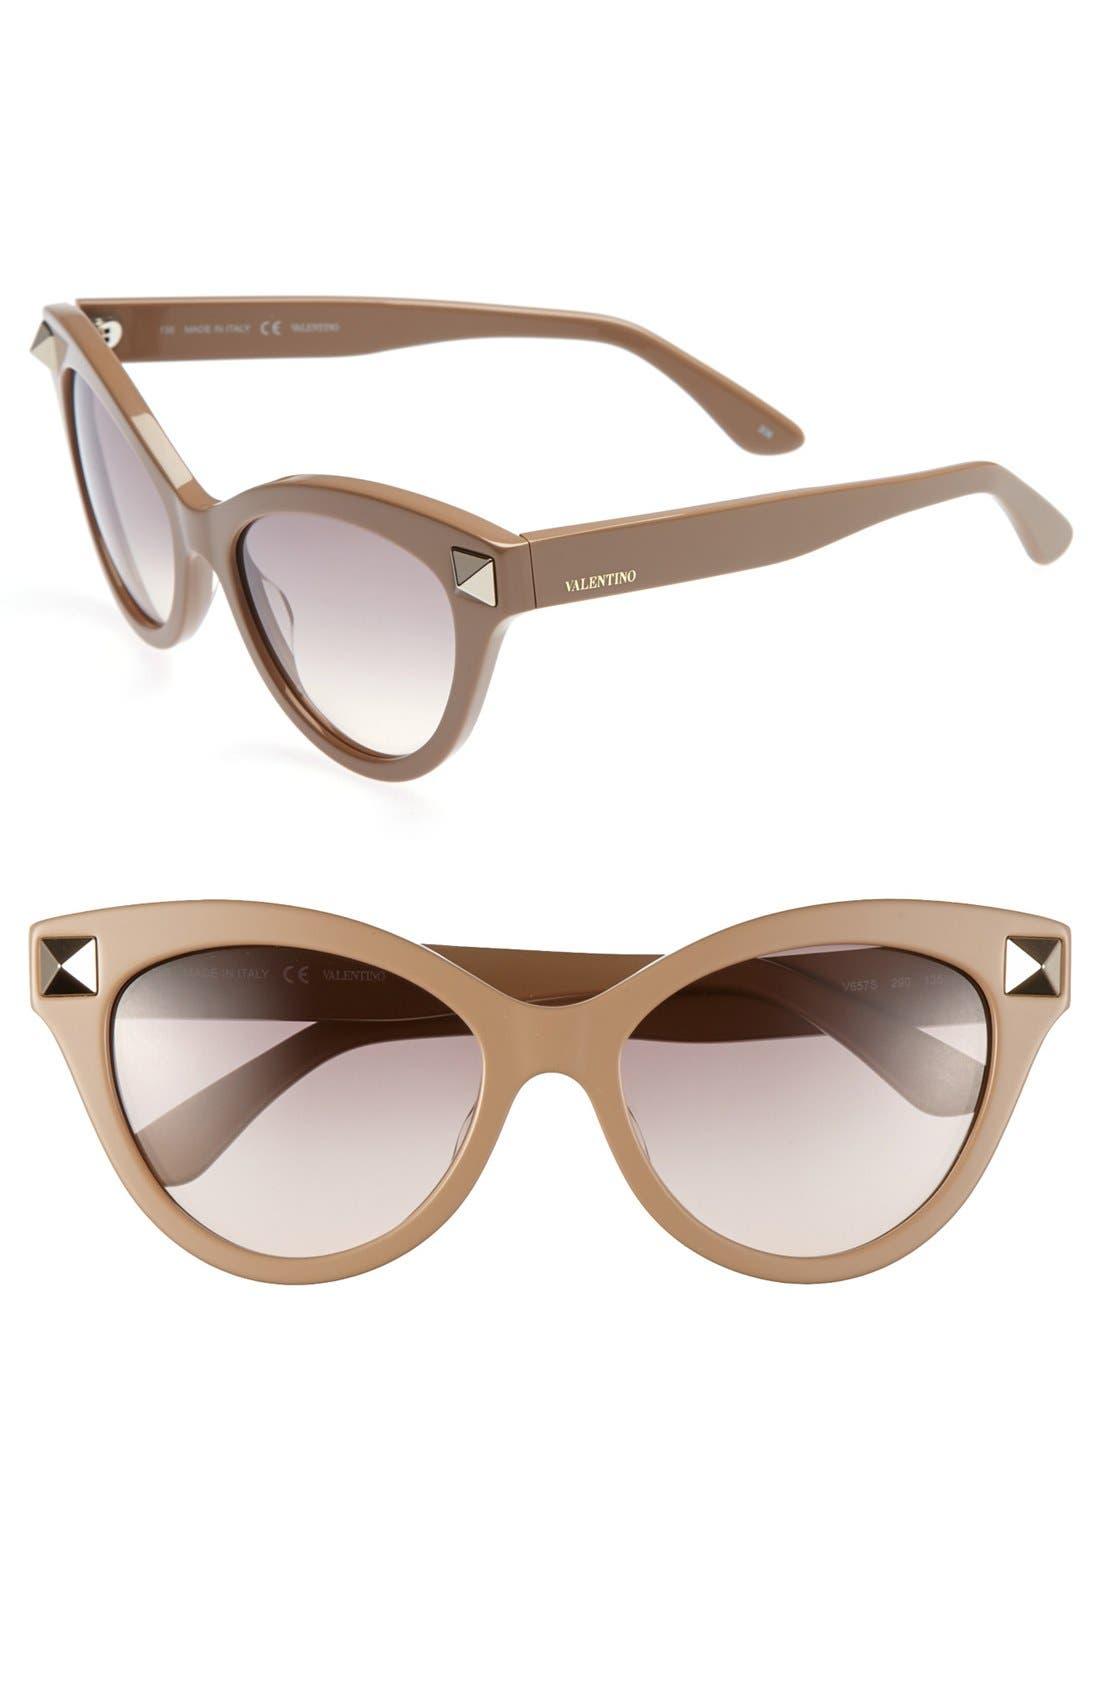 Main Image - Valentino 'Rockstud' 53mm Retro Sunglasses